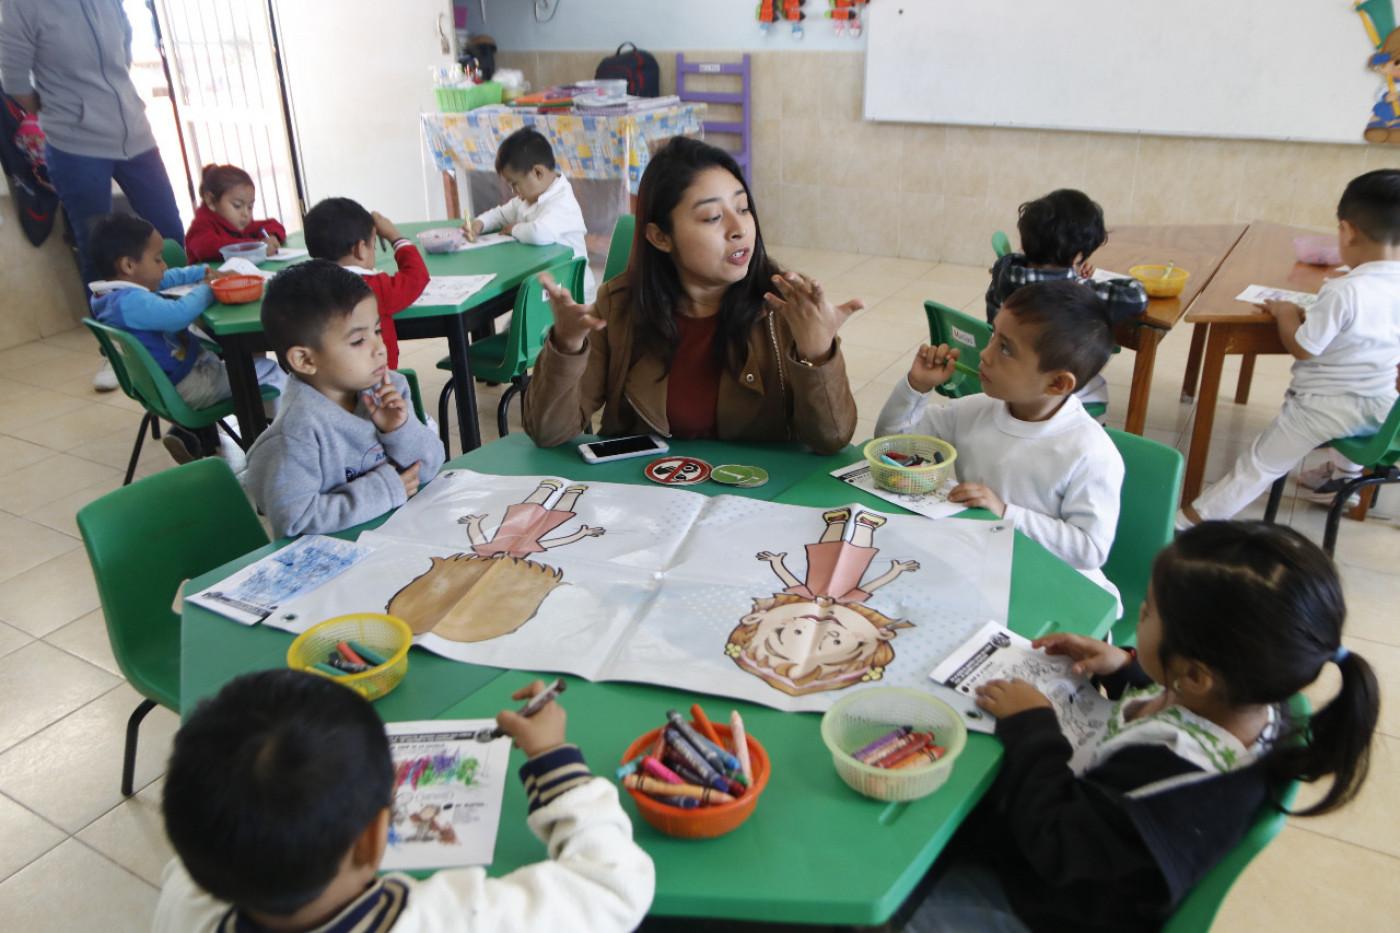 Visita al Jardín de niños U'najil U'xook en Chocholá